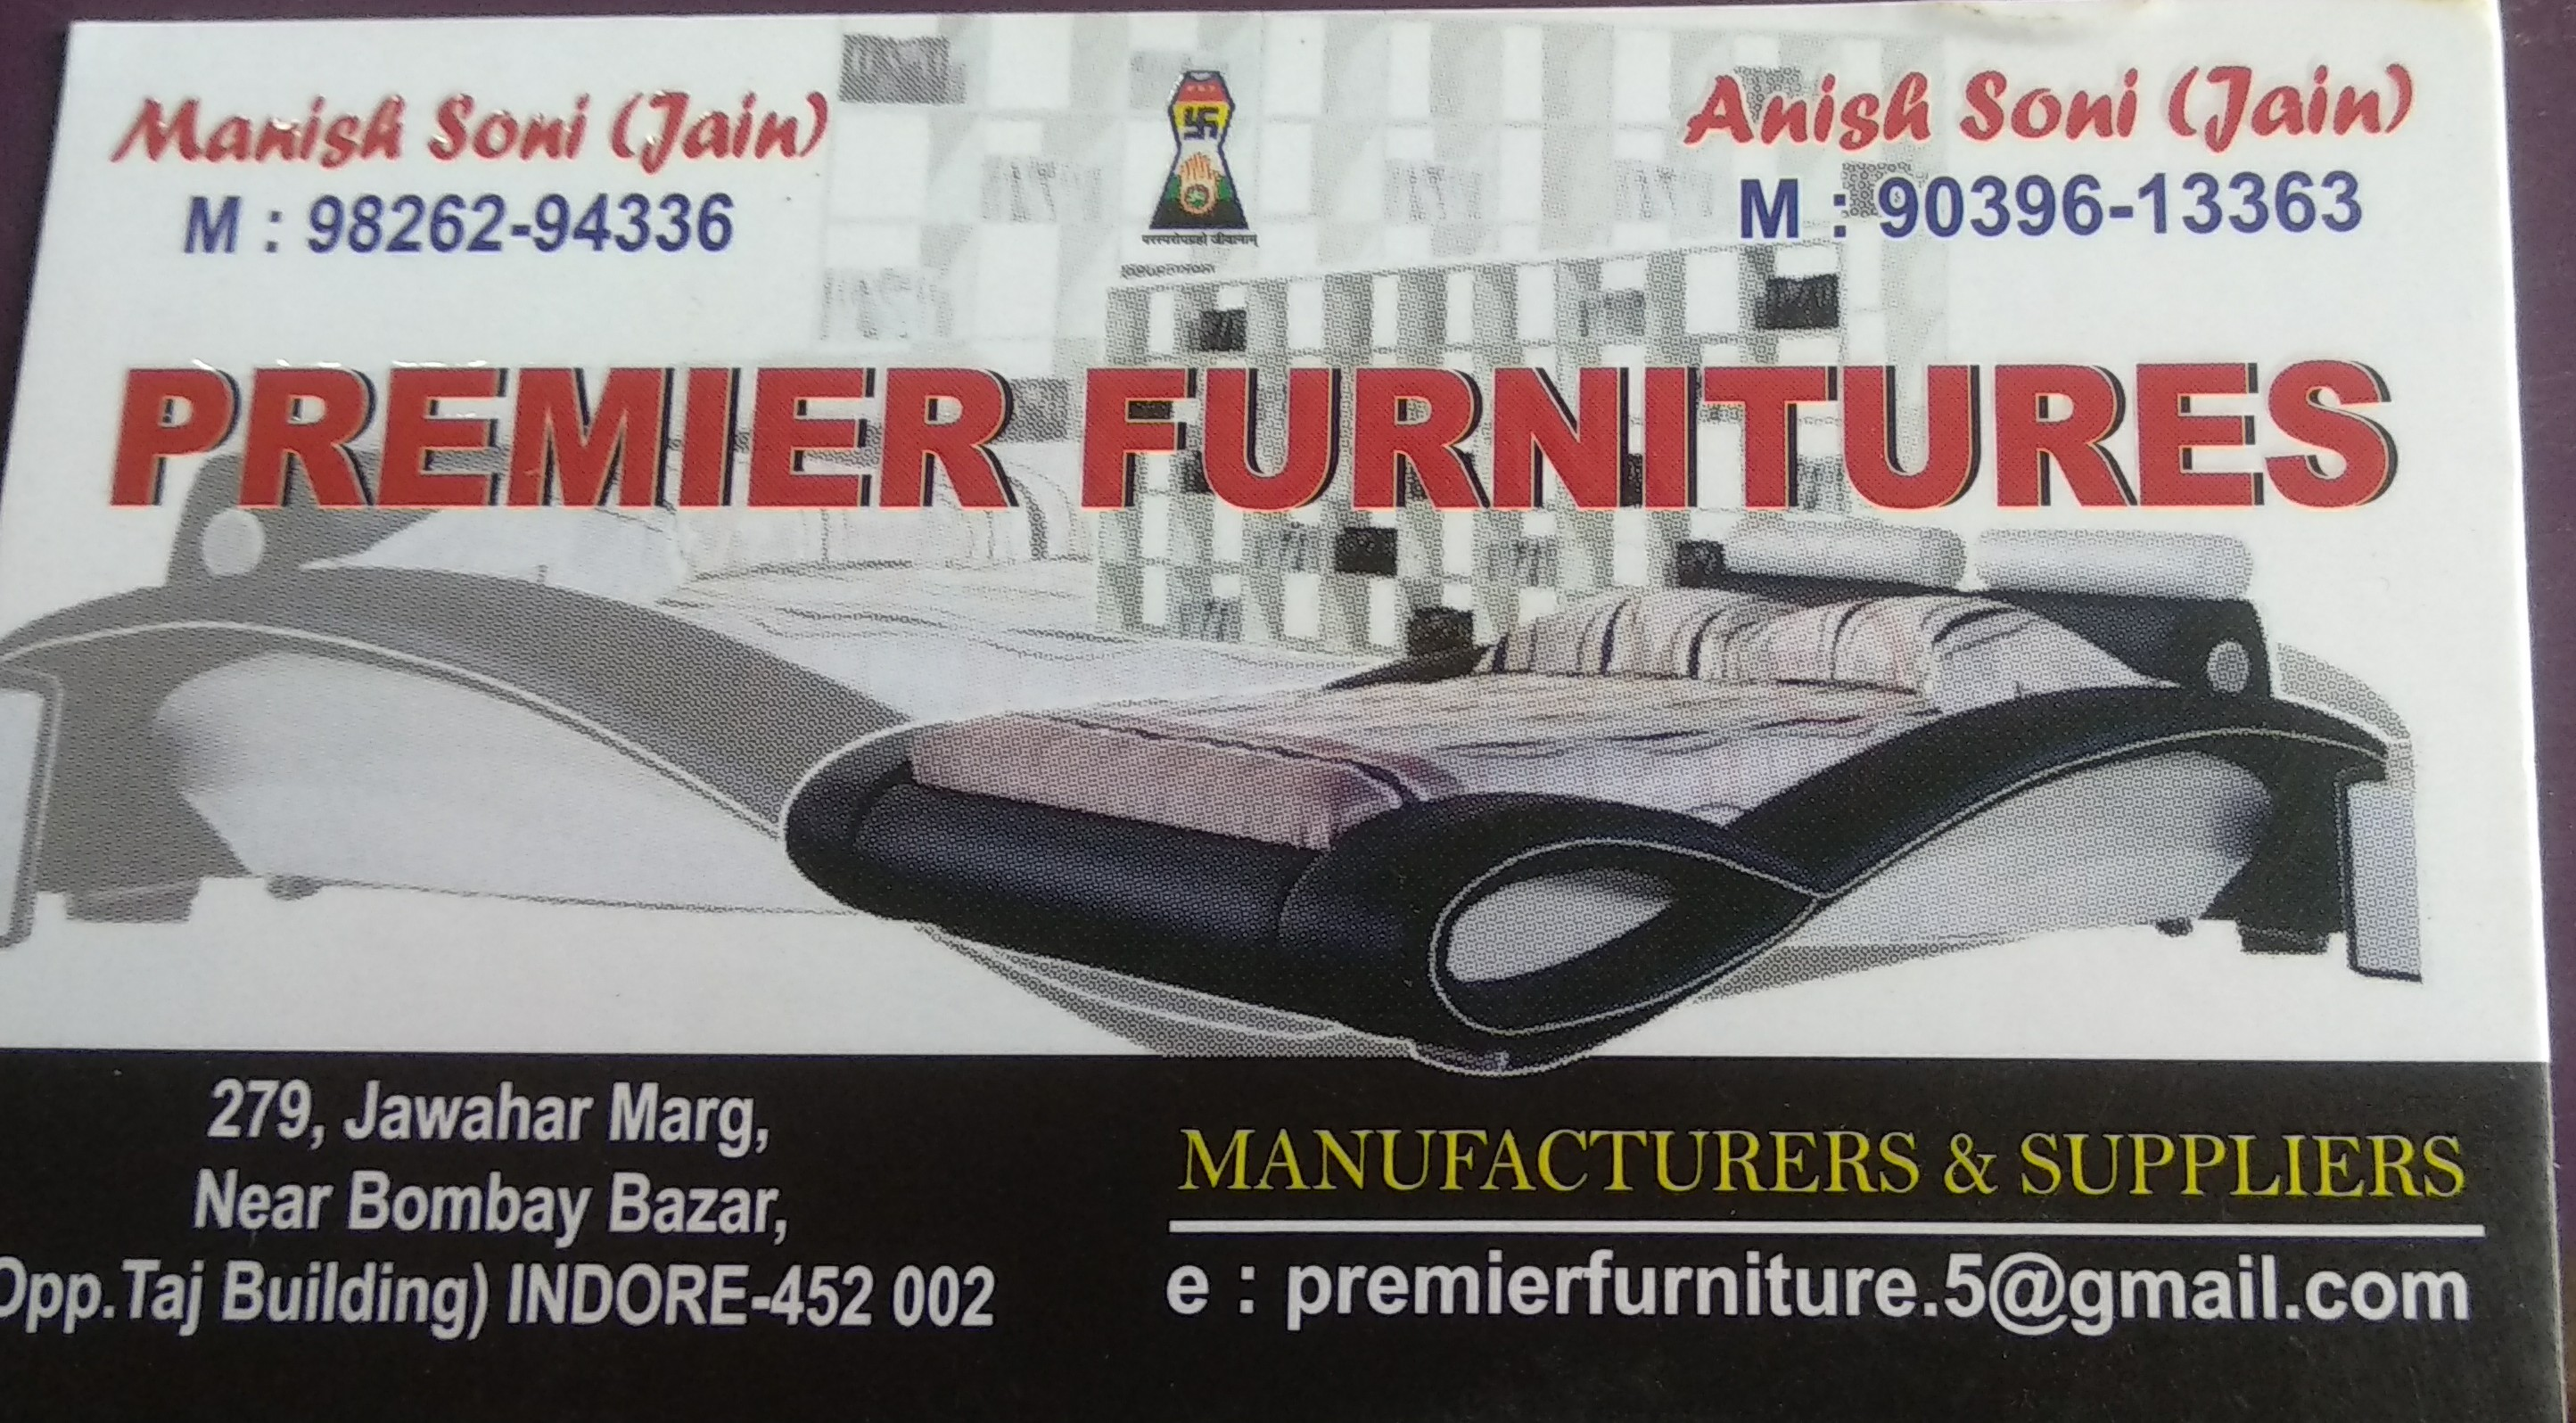 Premier furniture